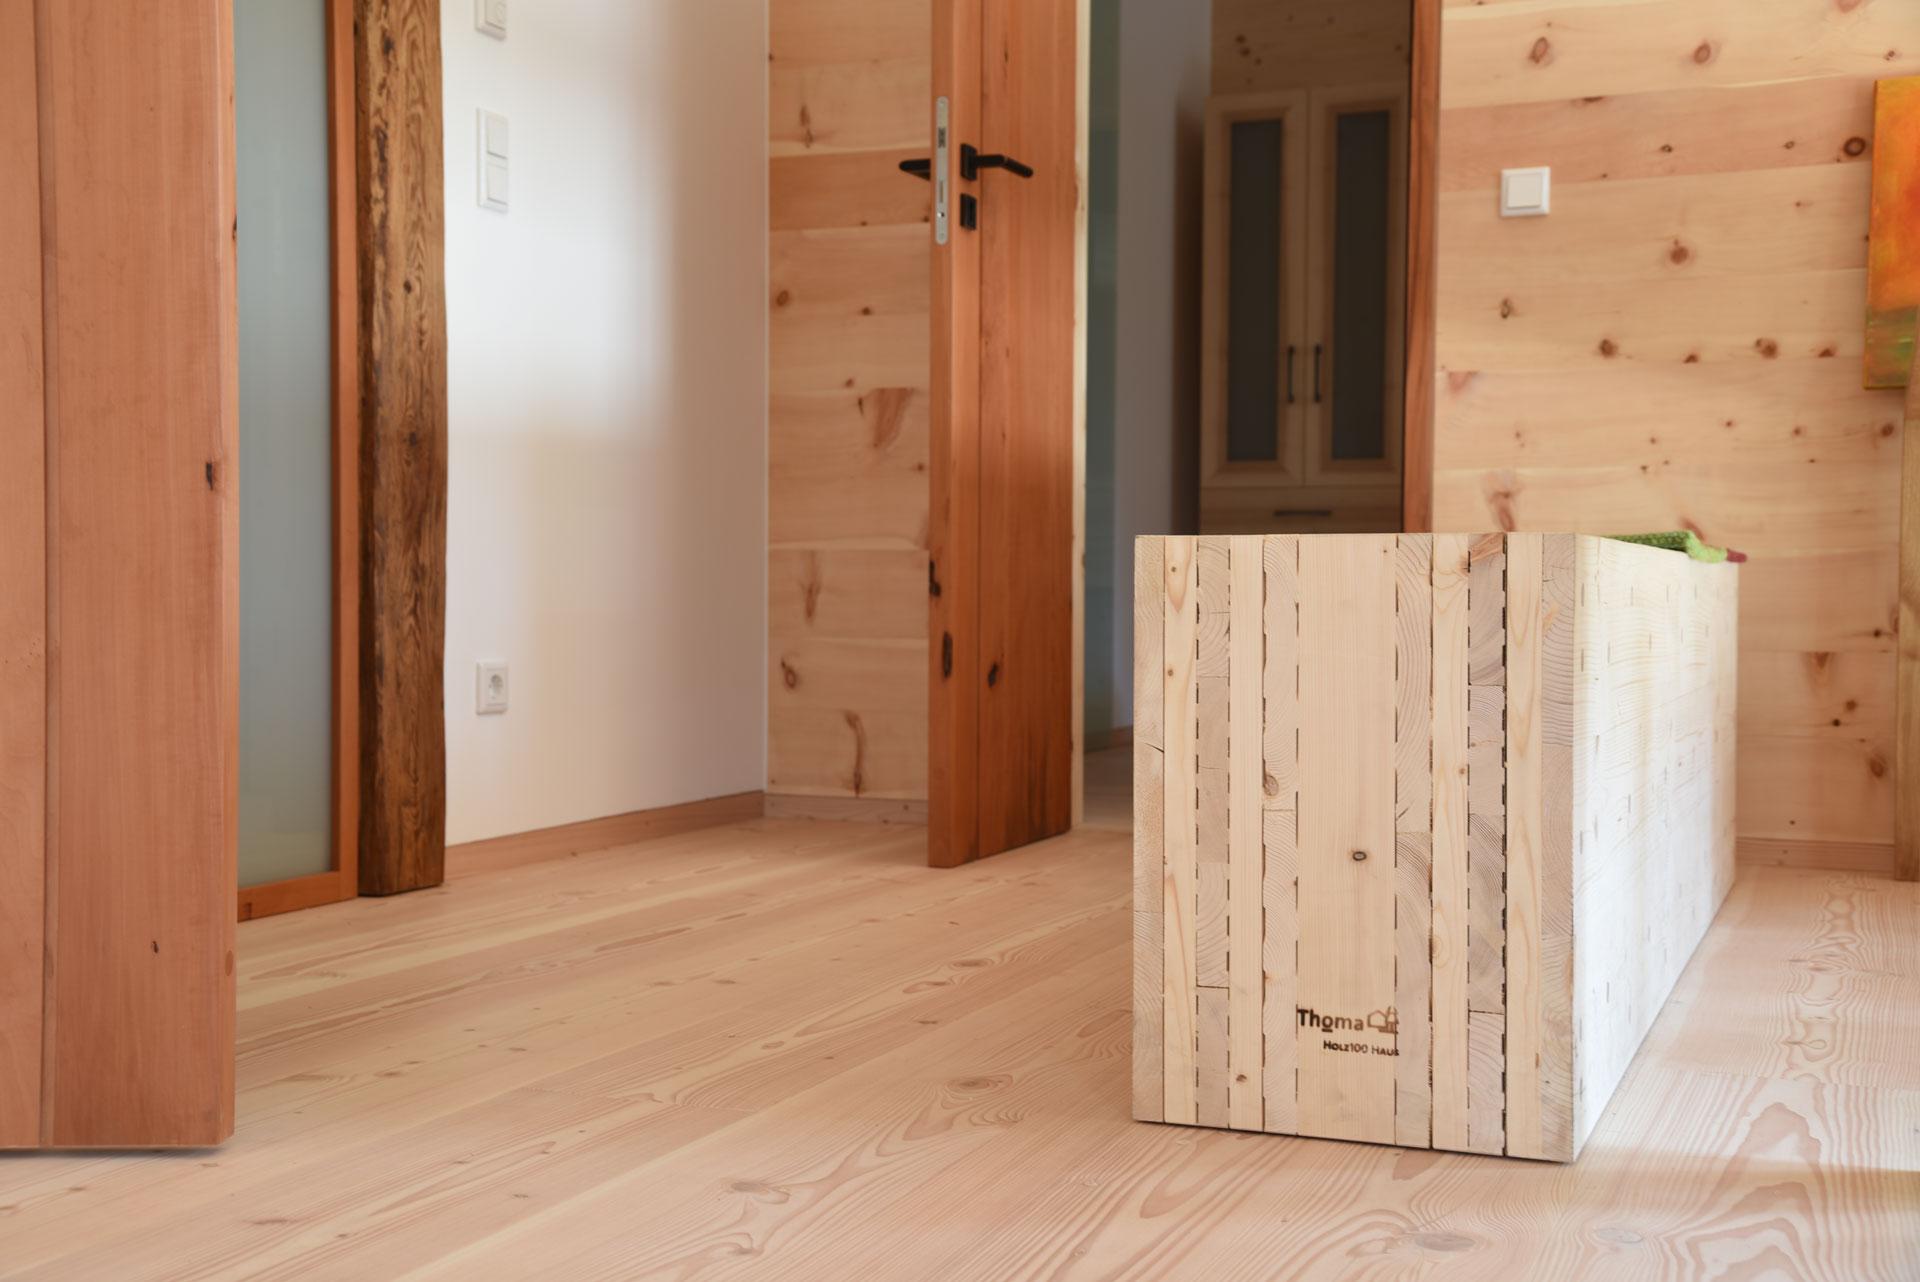 Wandaufbau Thoma Holz100 Haus